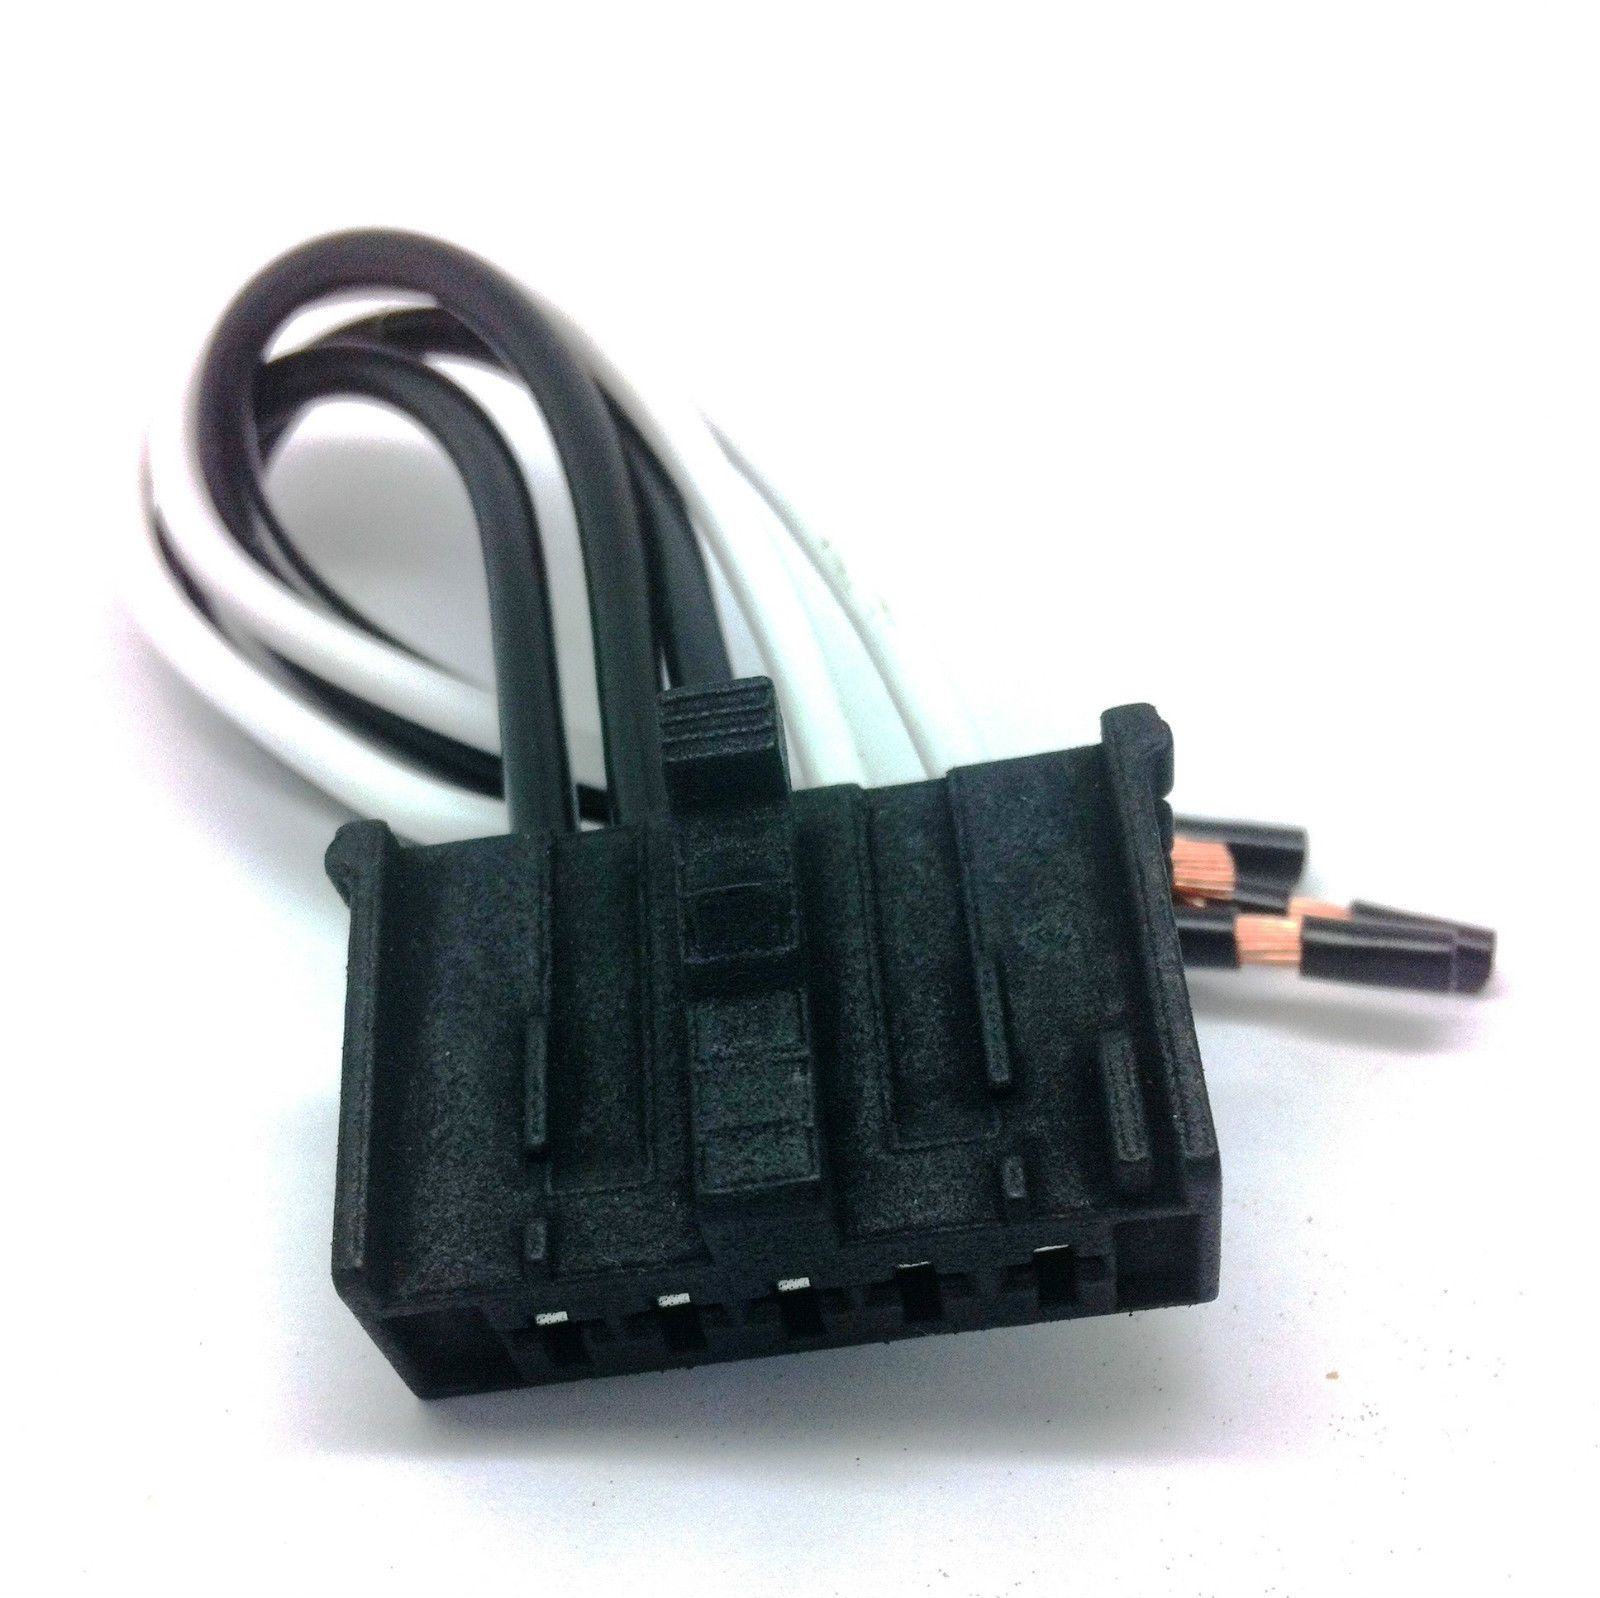 Alfa Romeo Mito Heater Resistor Wiring Harness Loom Repair Kit Connector Plug